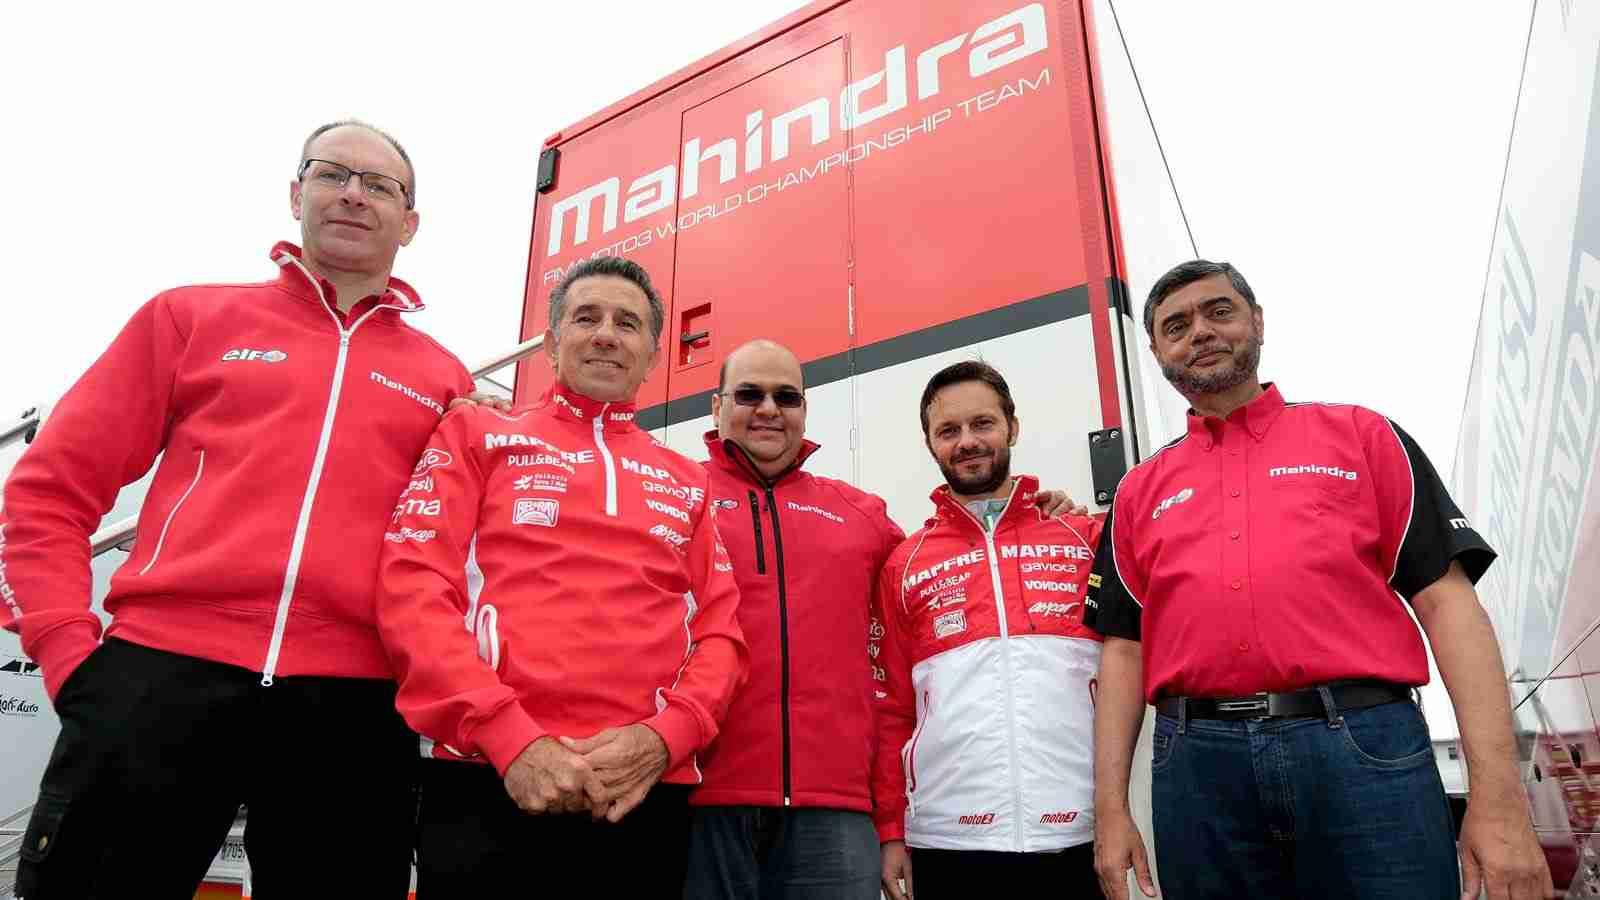 Mahindra Aspar - Borghesi,-Martinez,-Choonia,-Borsoi-and-SP-Shukla